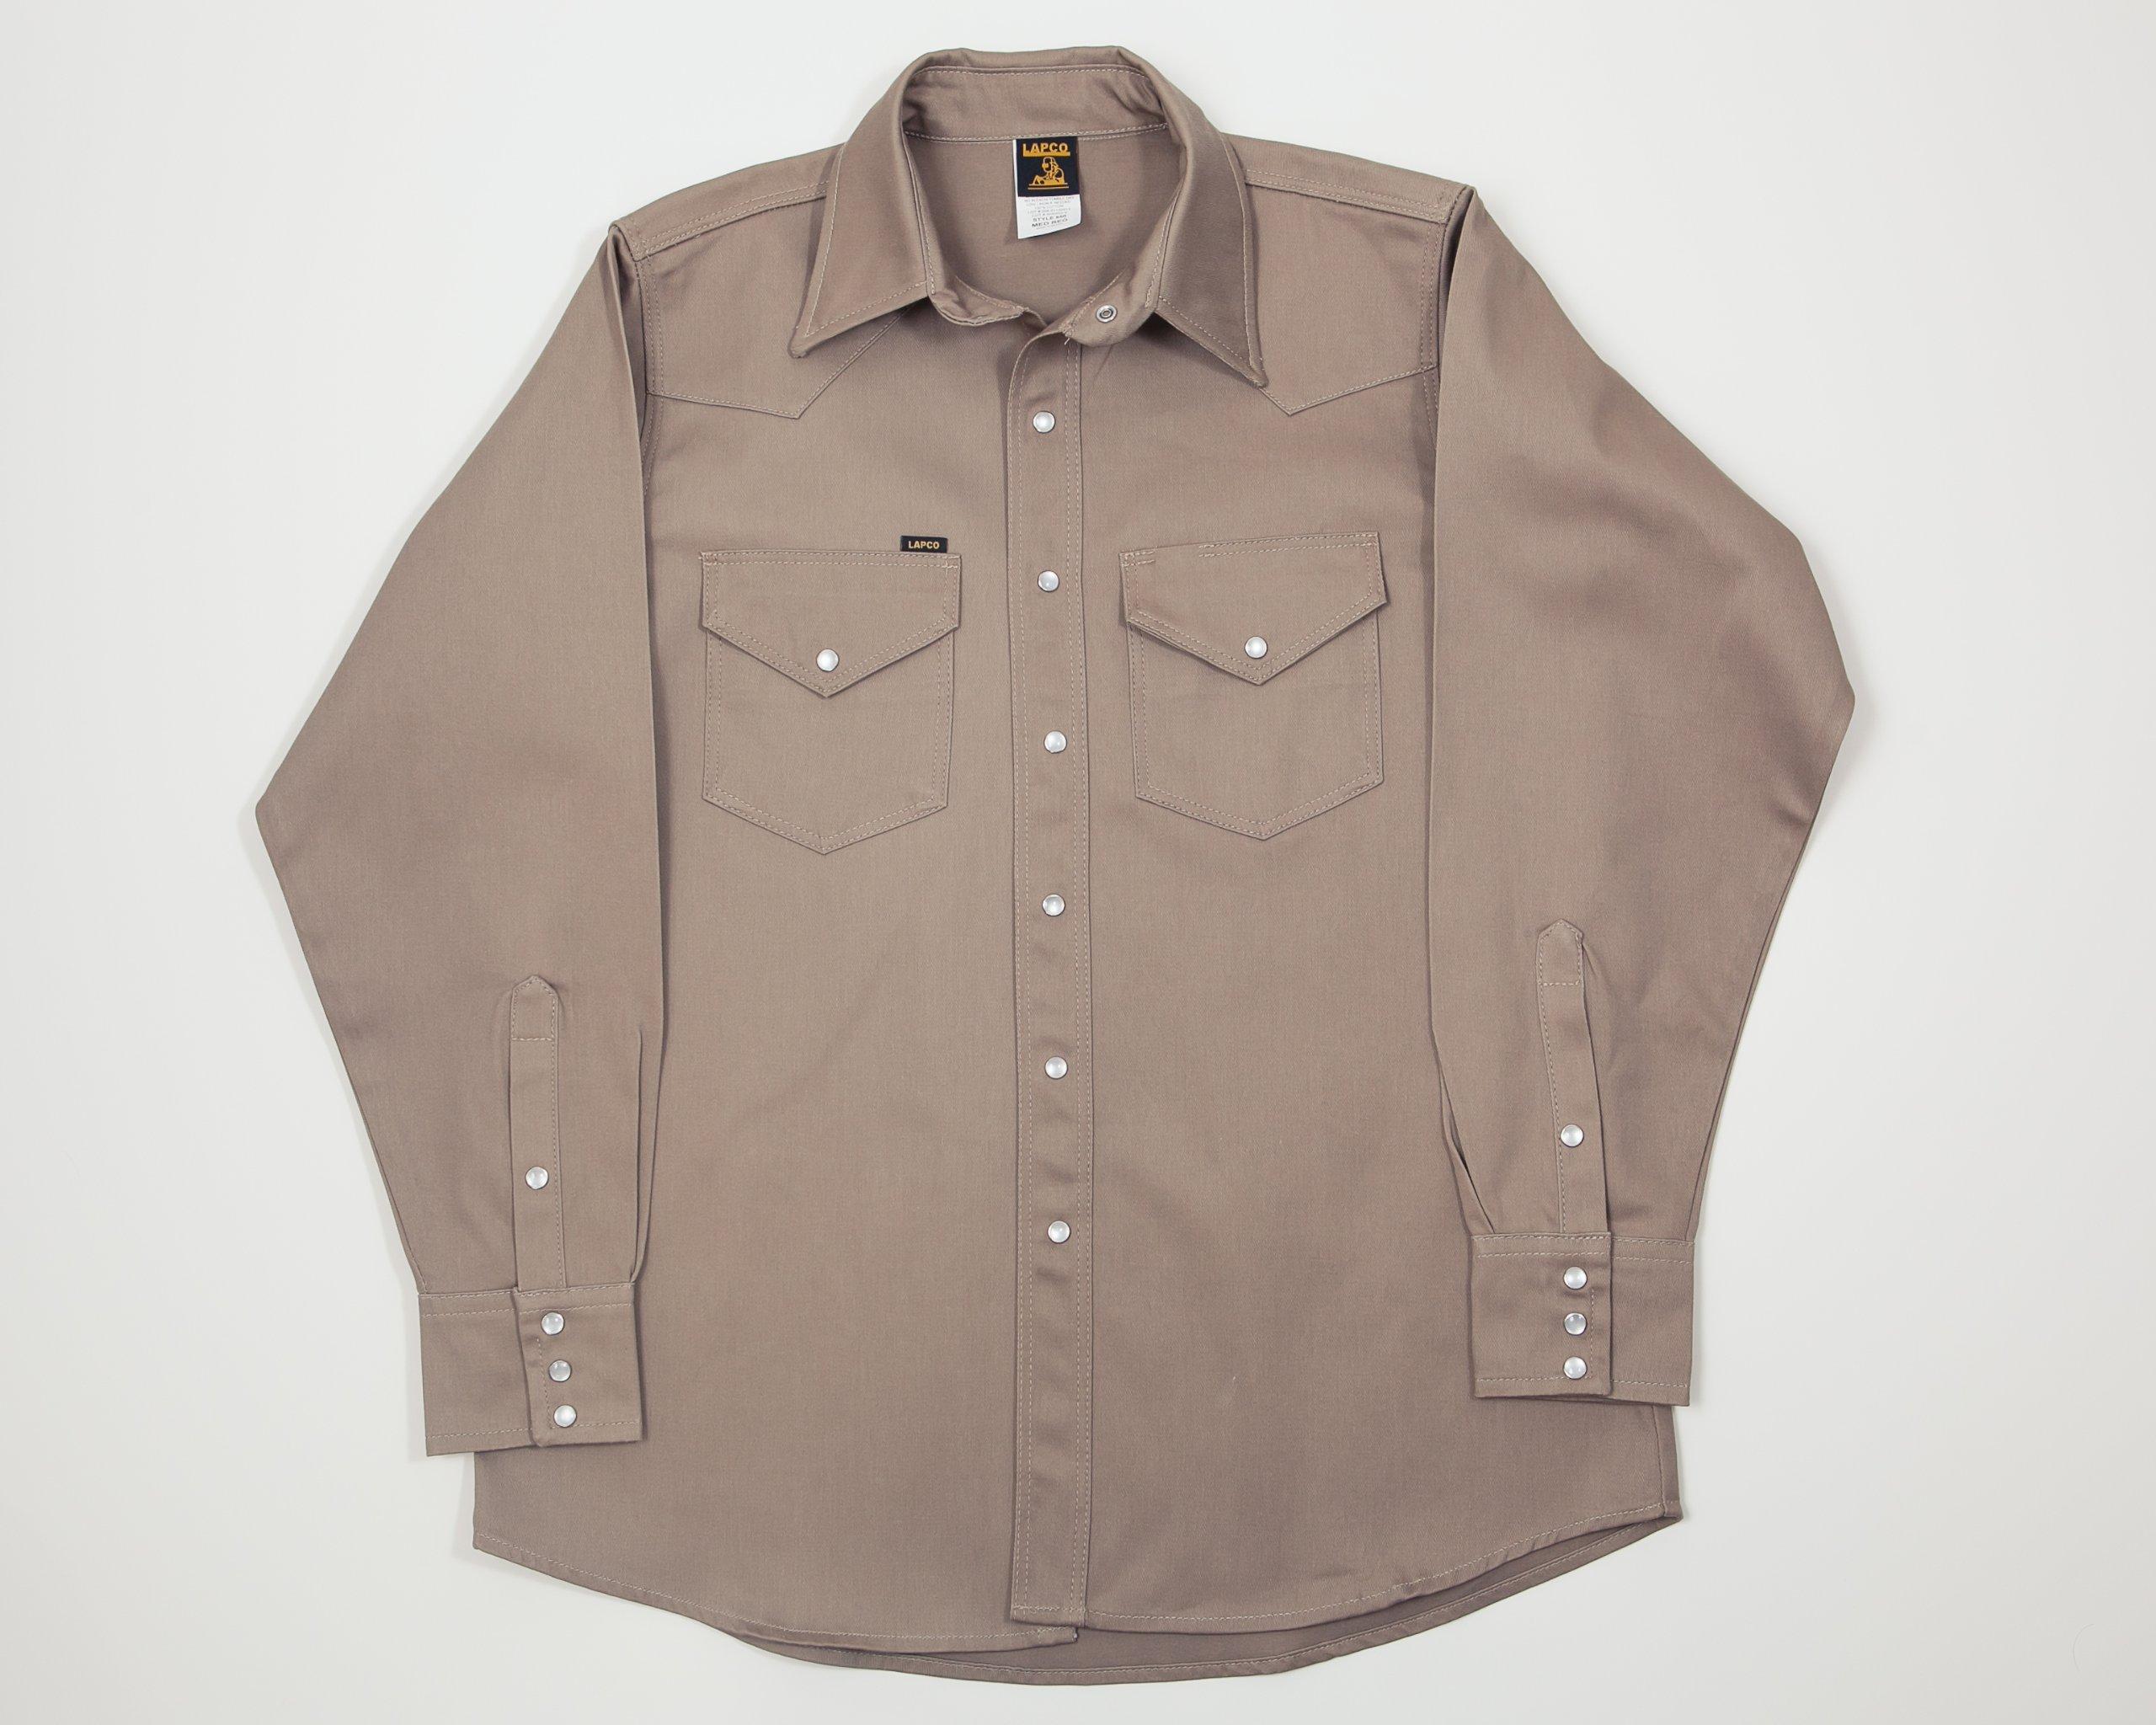 Lapco FR 850-MED-REG Mid-Weight Welder's Shirts, 100% Cotton, 8.5 oz, Medium Regular, Khaki